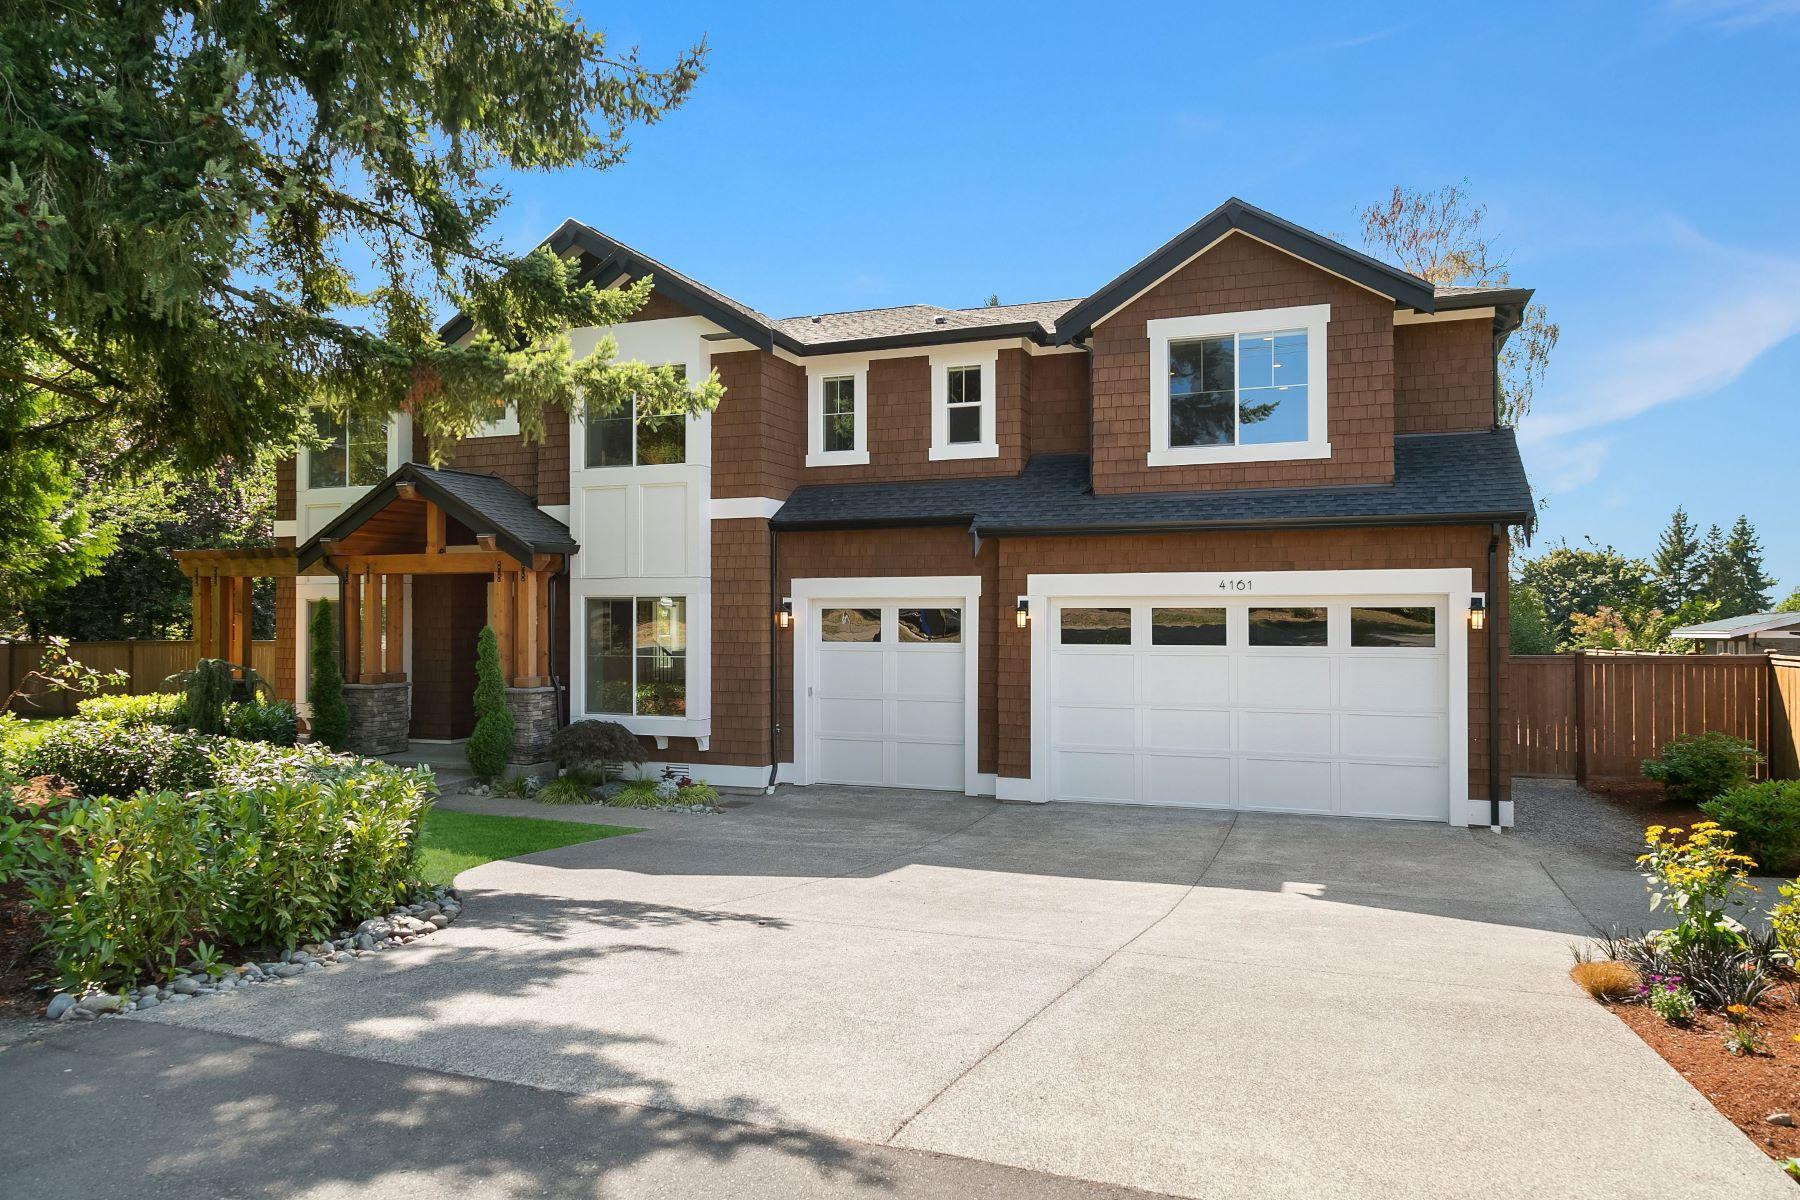 Single Family Homes for Sale at 4161 86th Avenue Southeast, Mercer Island, WA 98040 4161 86th Avenue Southeast Mercer Island, Washington 98040 United States